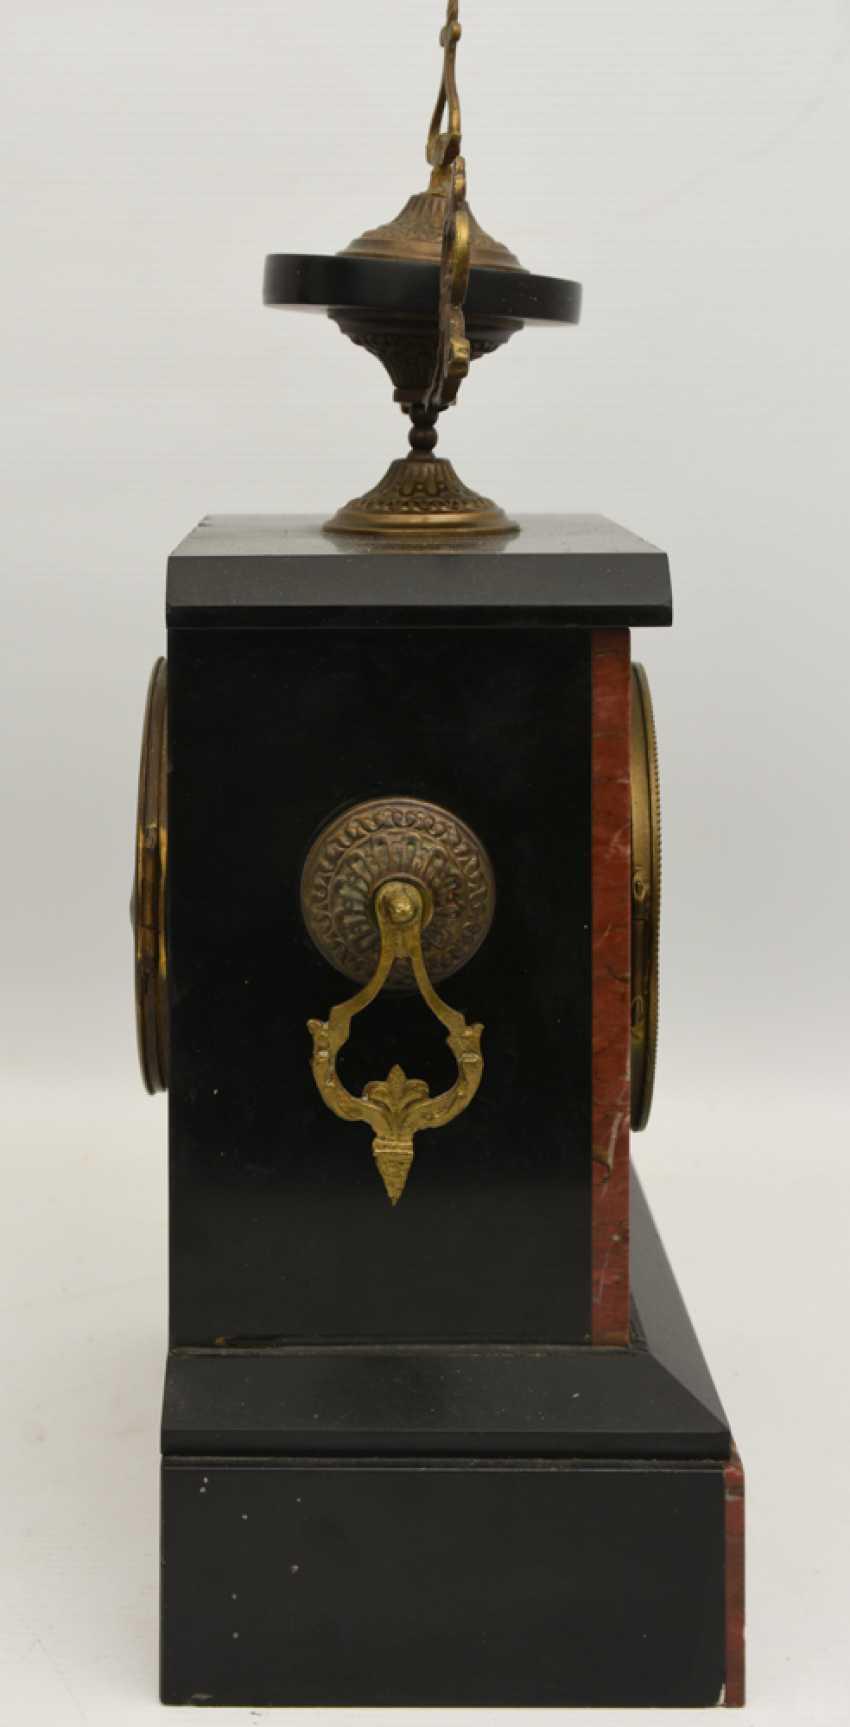 Mantel clock, Empire style, marble/glass/metal, France 20. Century - photo 3